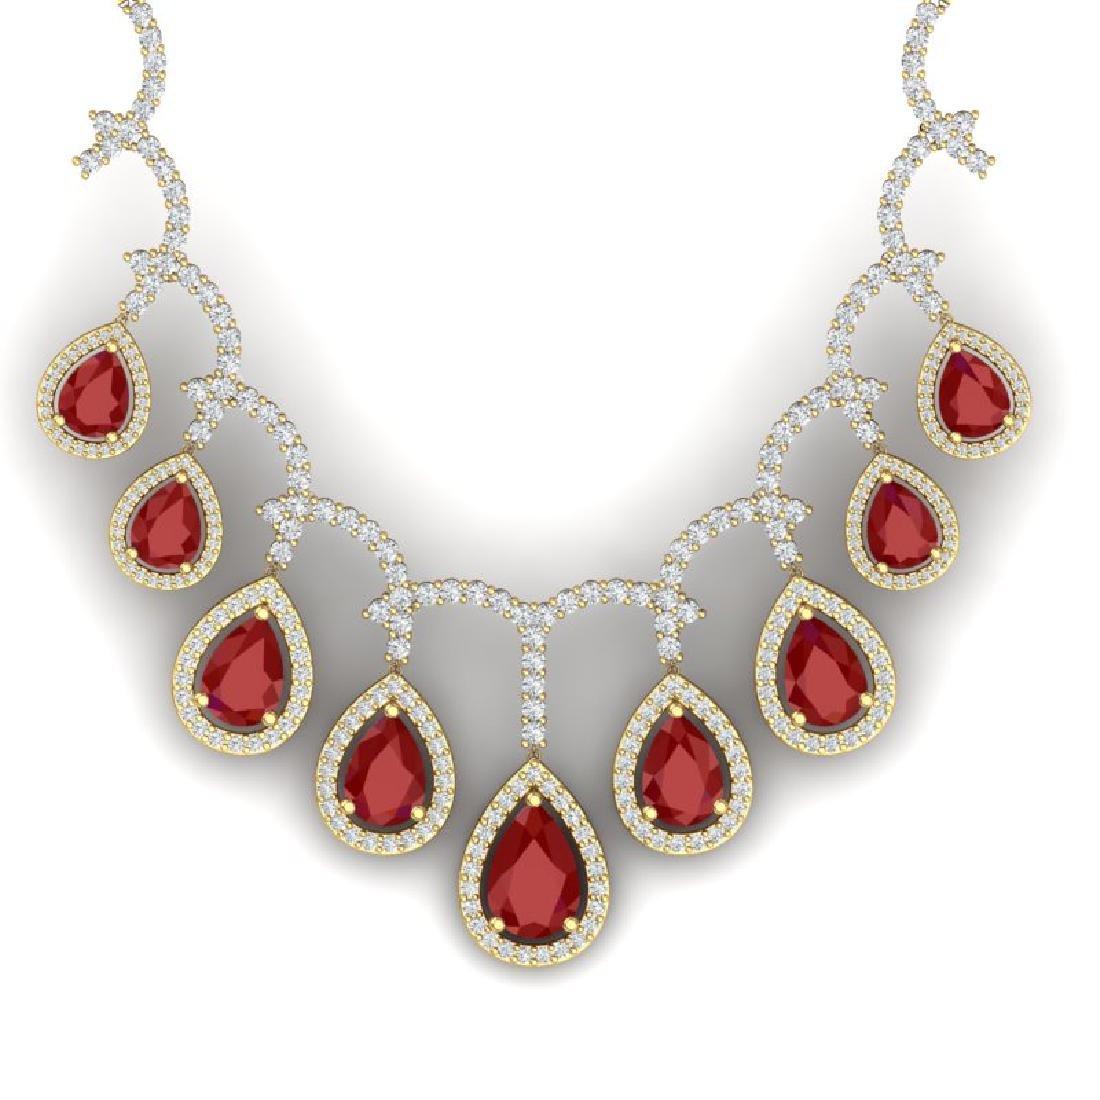 31.5 CTW Royalty Designer Ruby & VS Diamond Necklace